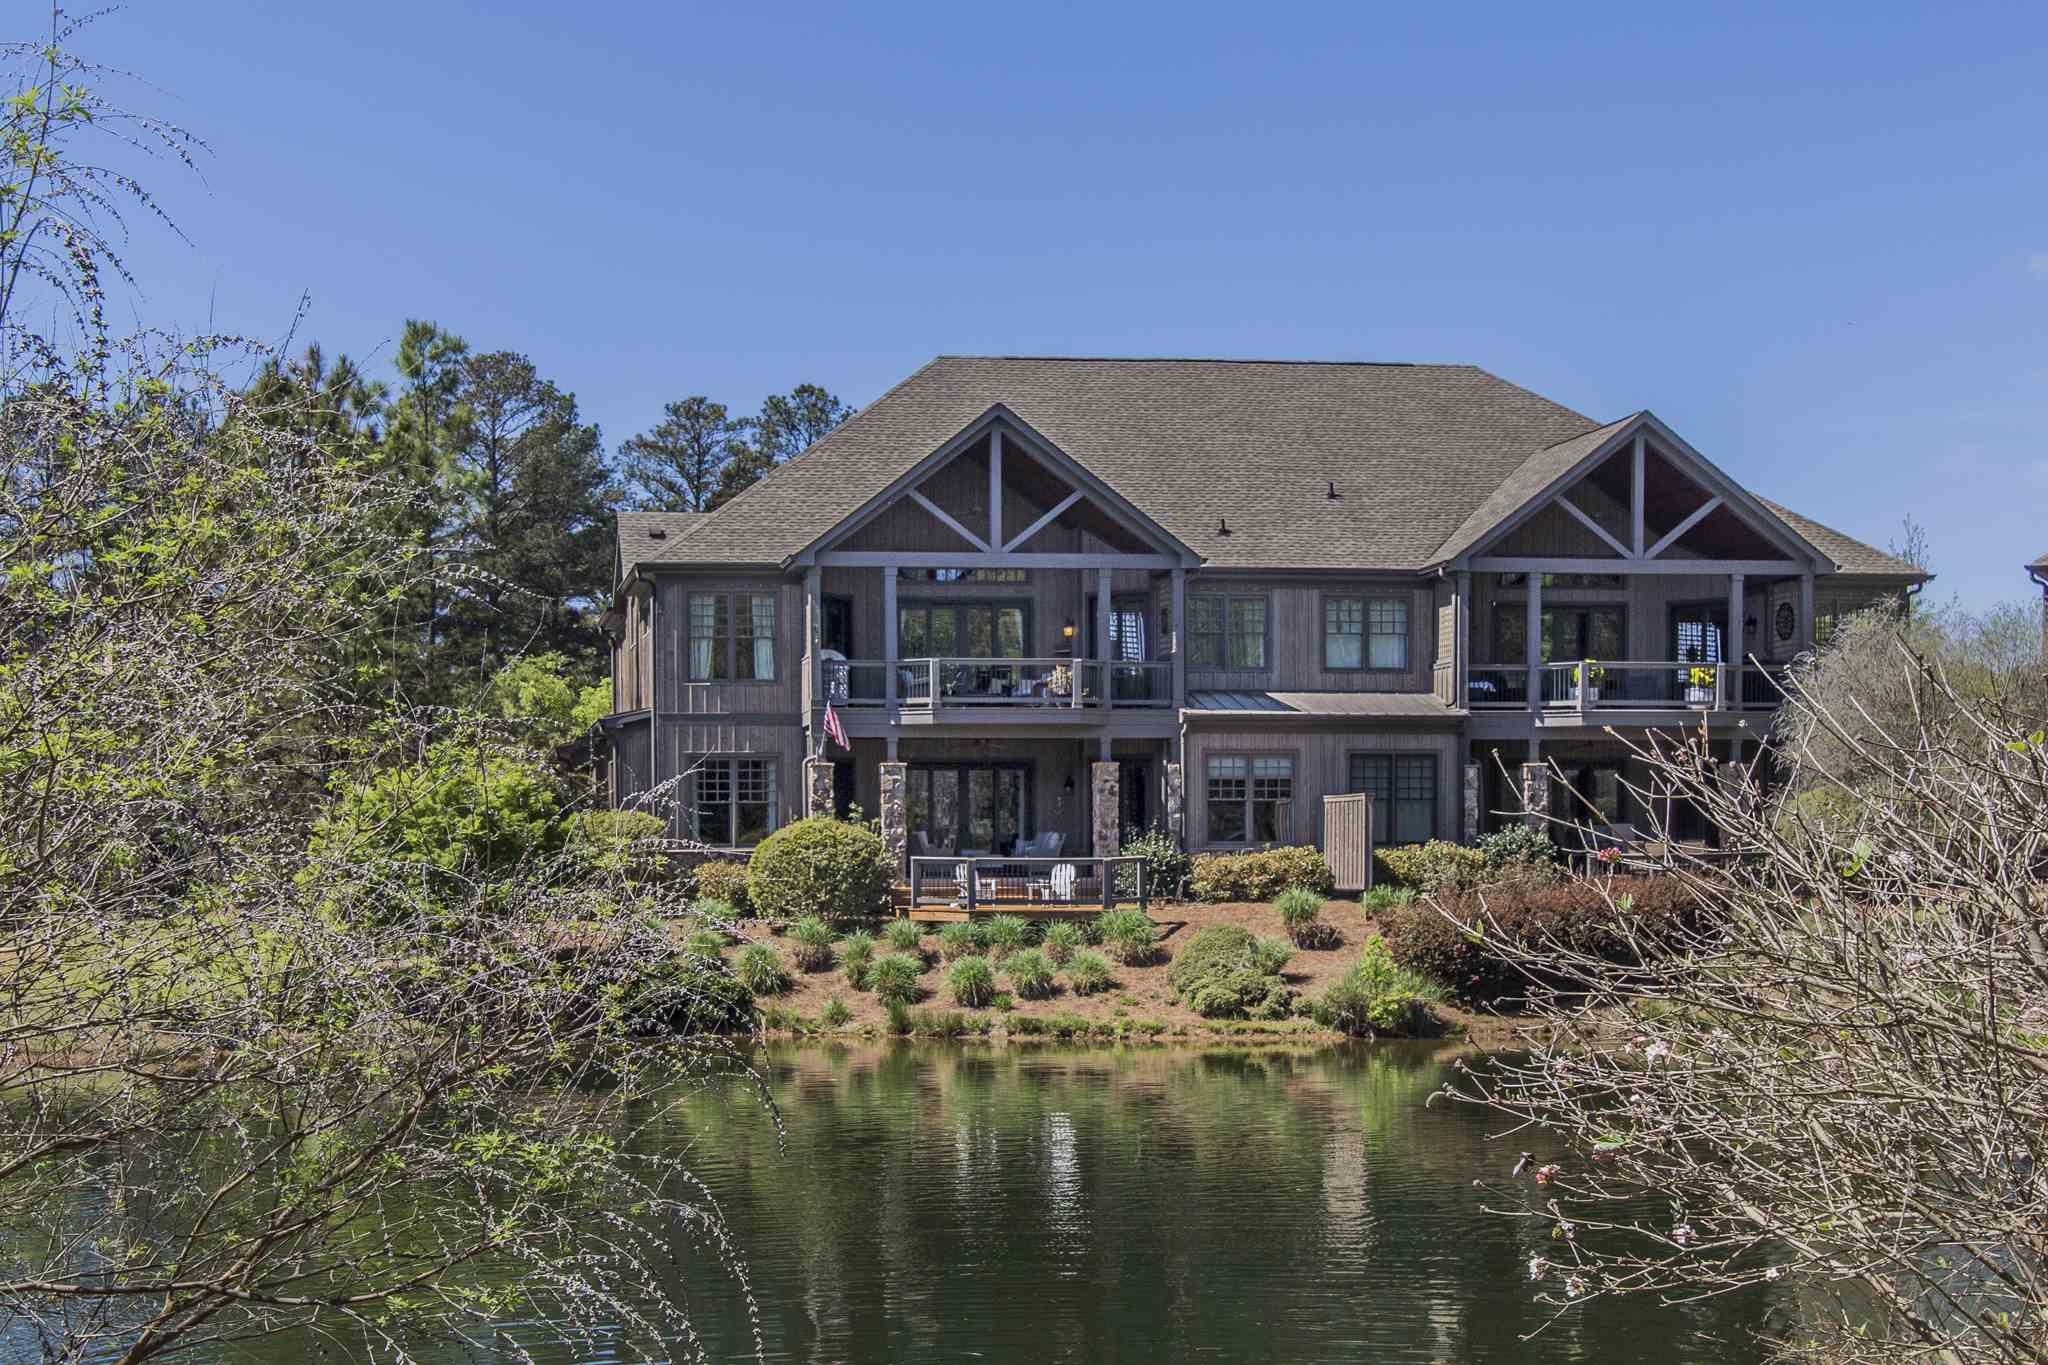 One of Lake Oconee 3 Bedroom Homes for Sale at 127 D ARBORS LANE